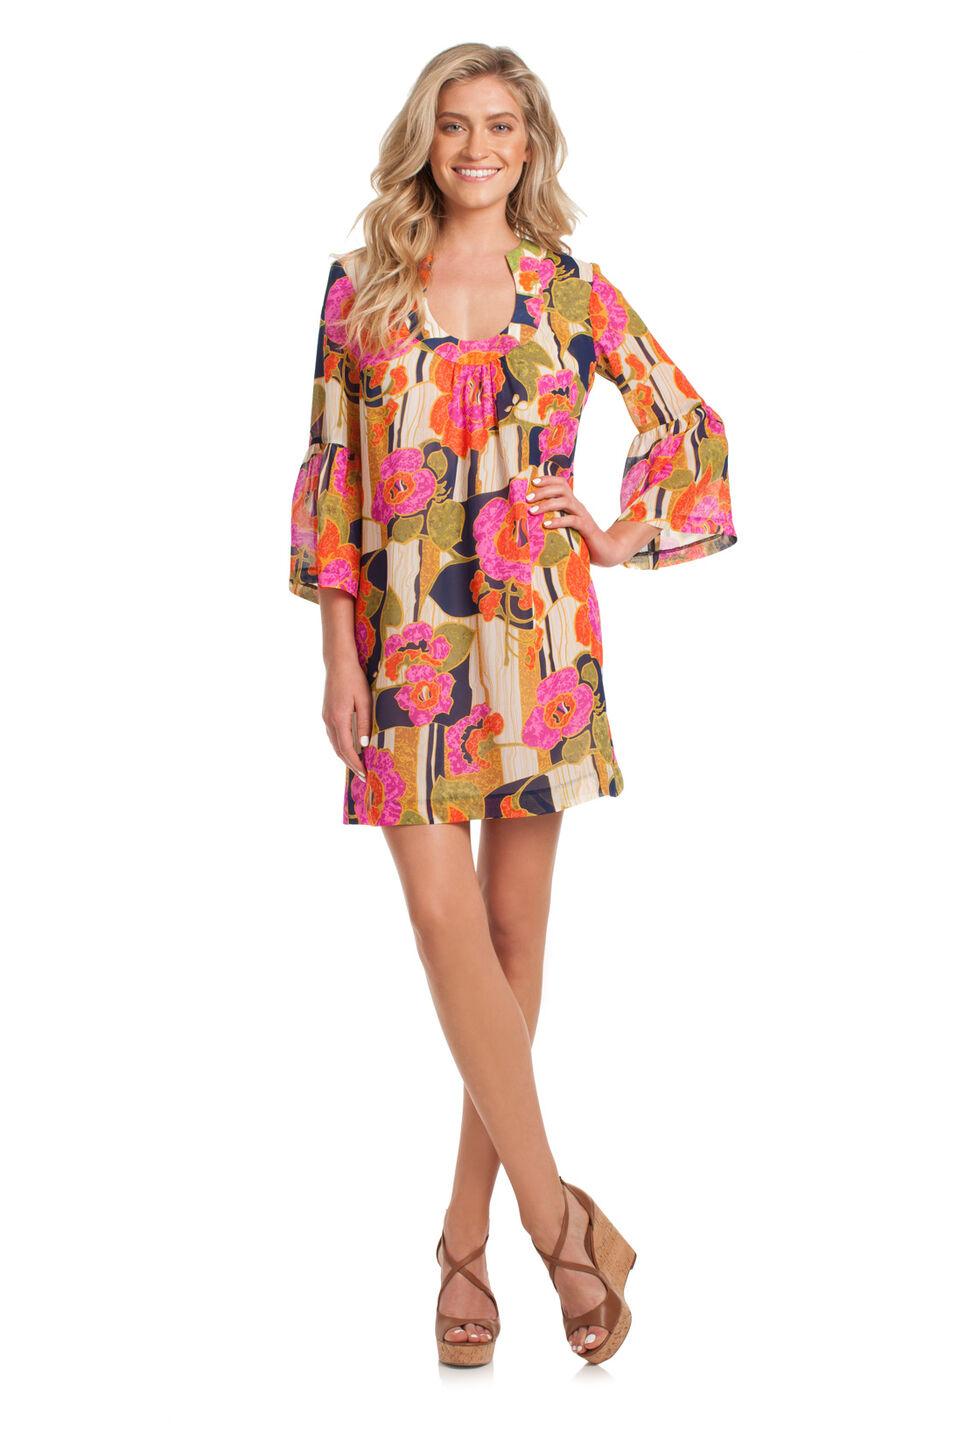 Trina Turk Bonita Dress - Multi - Size 10